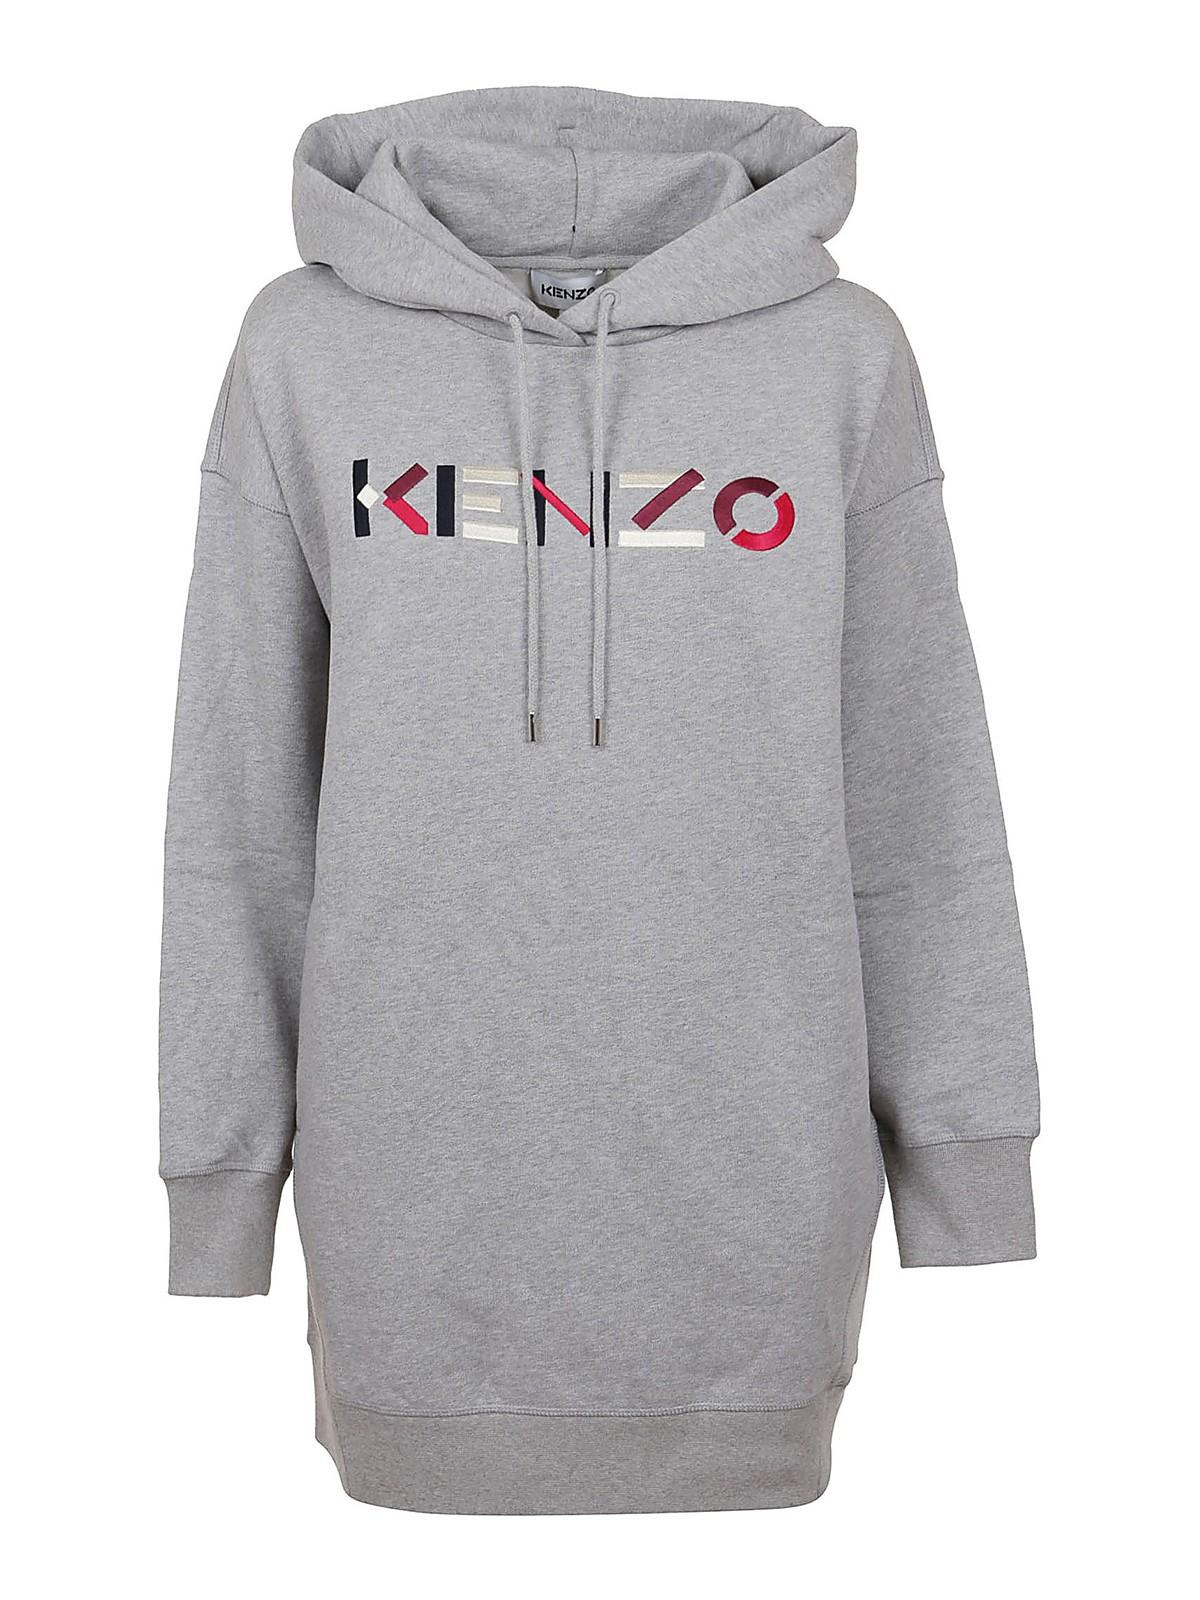 KENZO LOGO EMBROIDERY HOODED DRESS